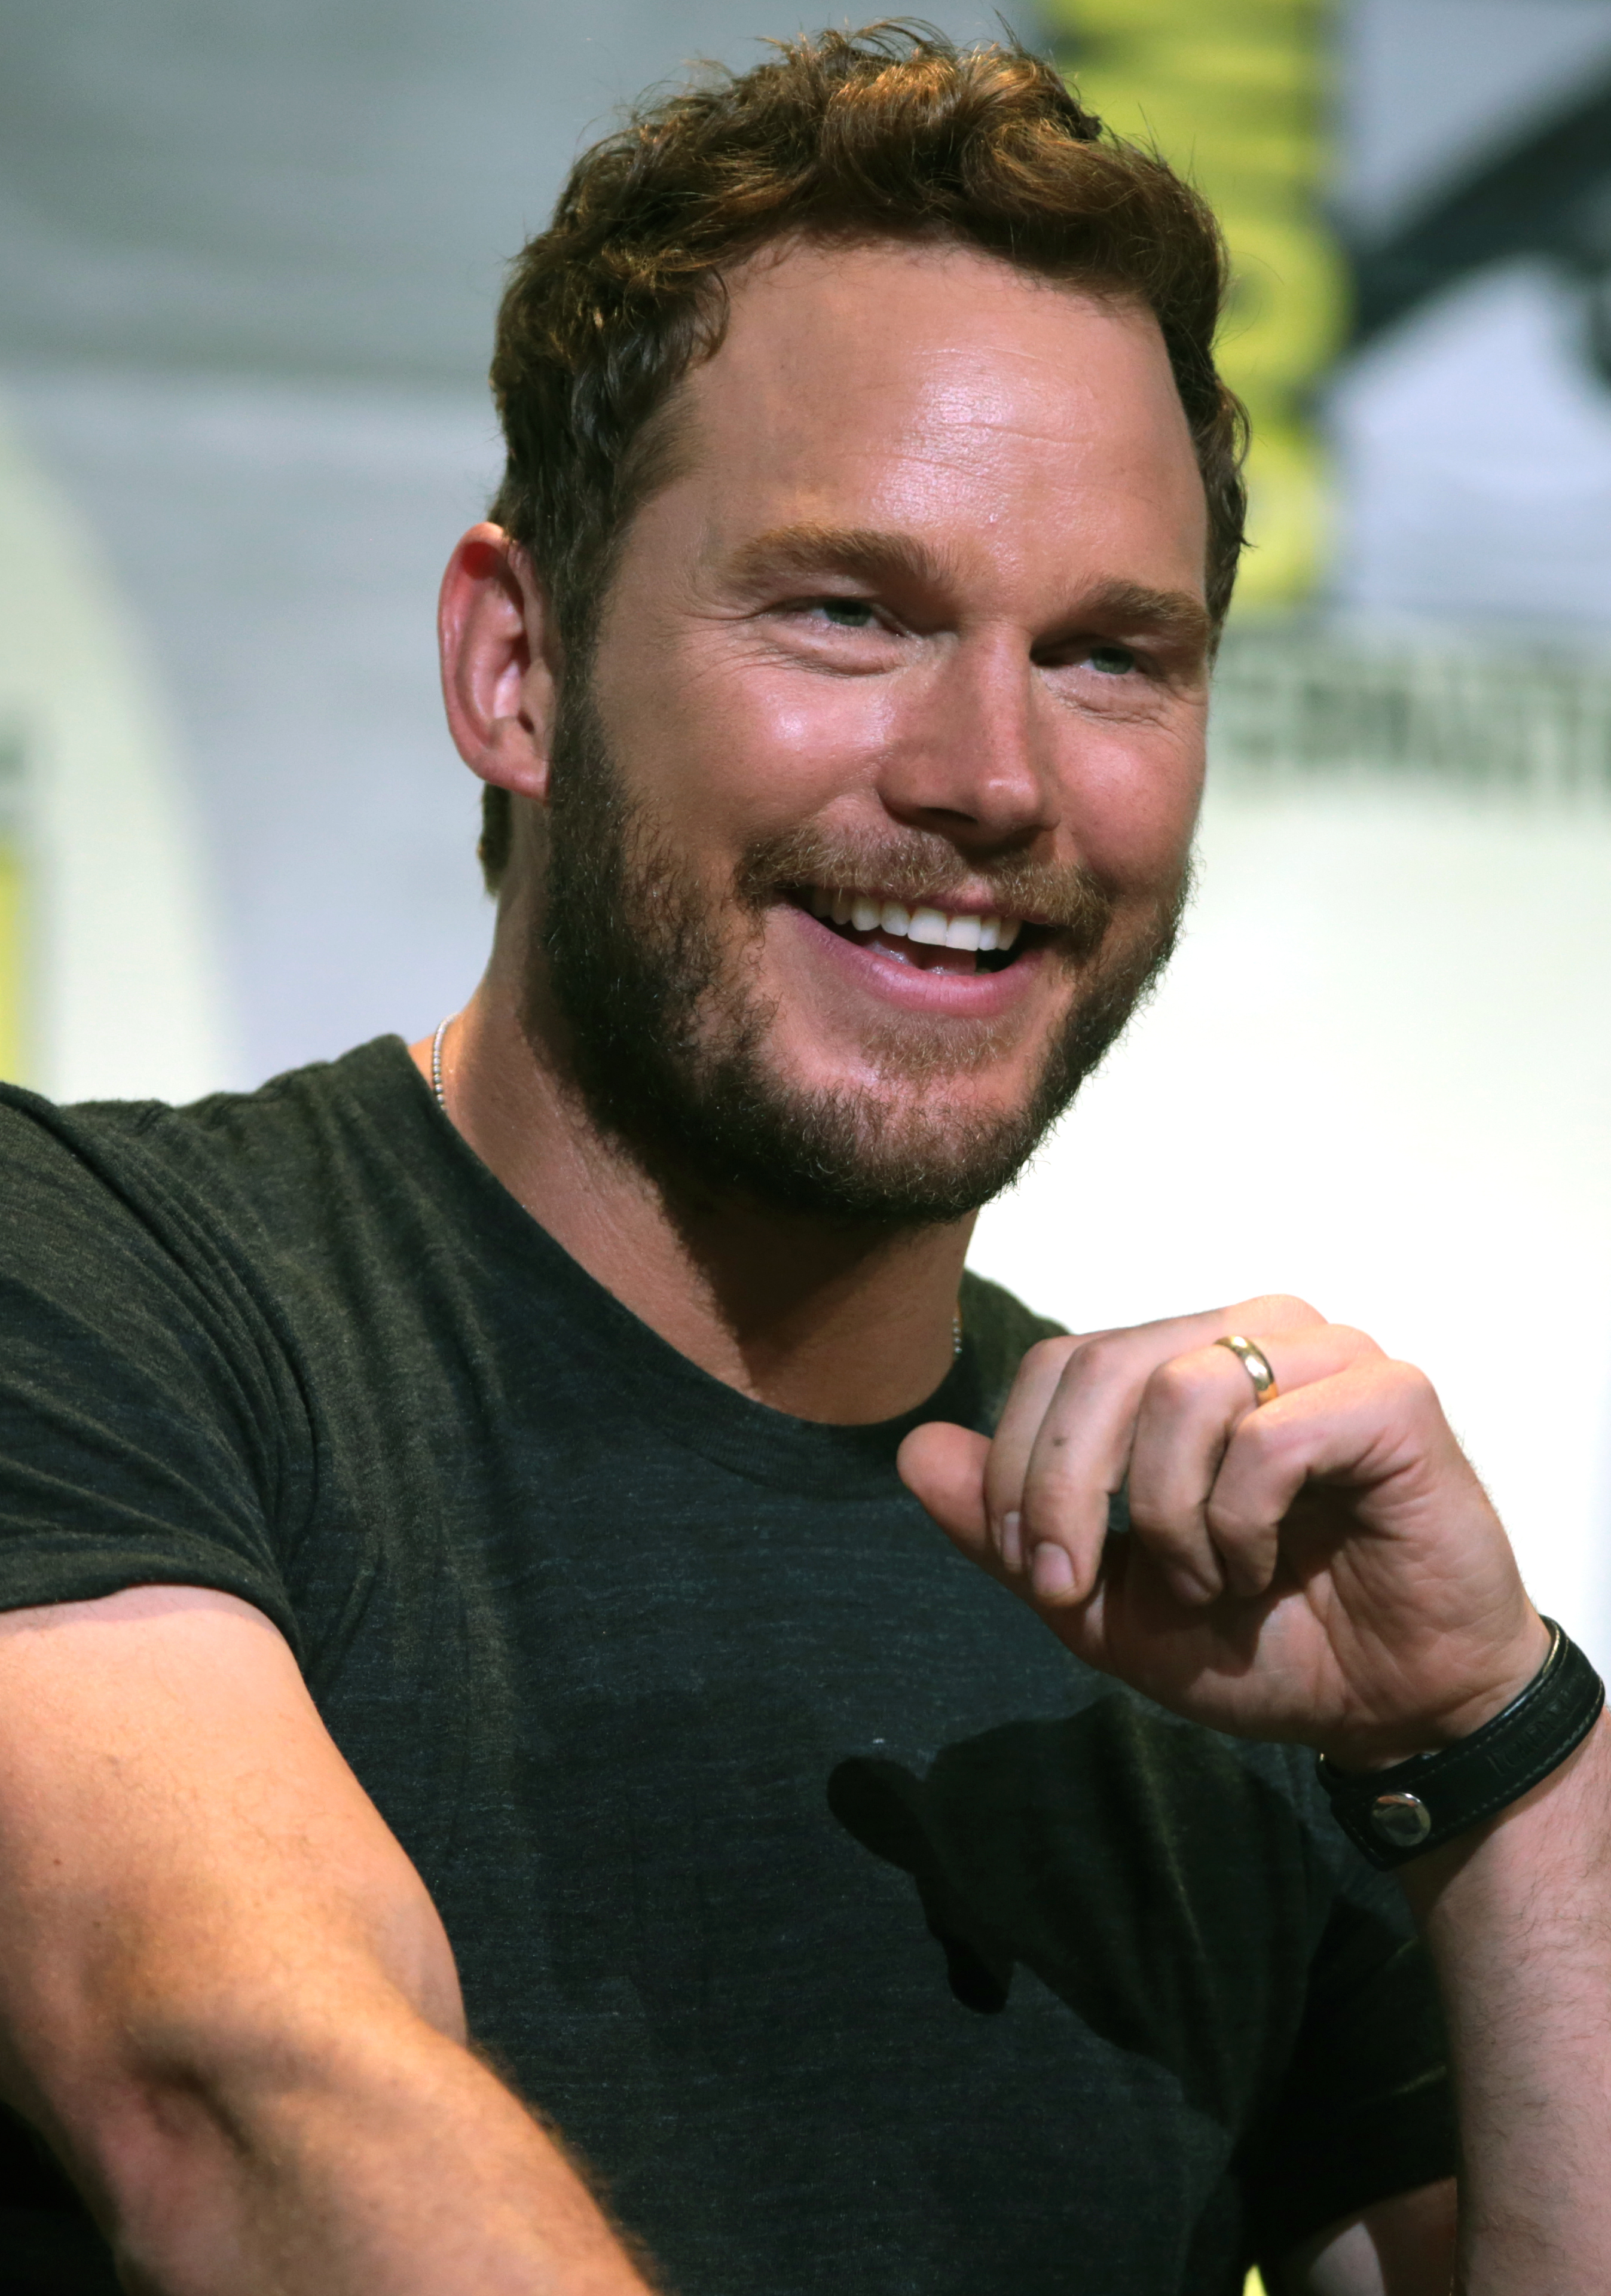 Chris Pratt Wiki >> File:Chris Pratt (28630392396) (cropped).jpg - Wikimedia Commons